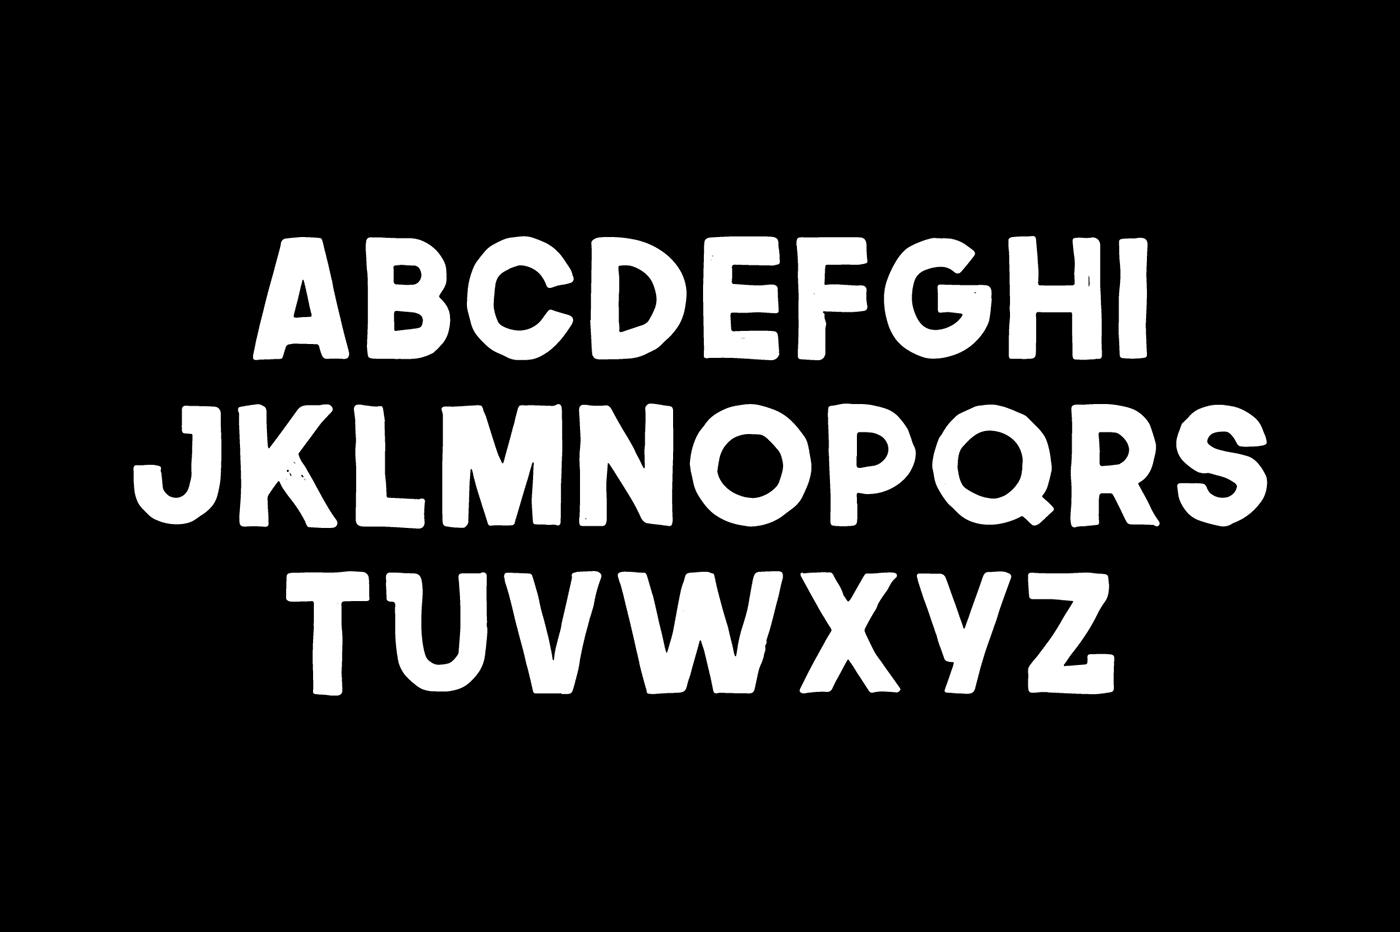 graphic design  font type typography   graphic logo designer Love handmade craft